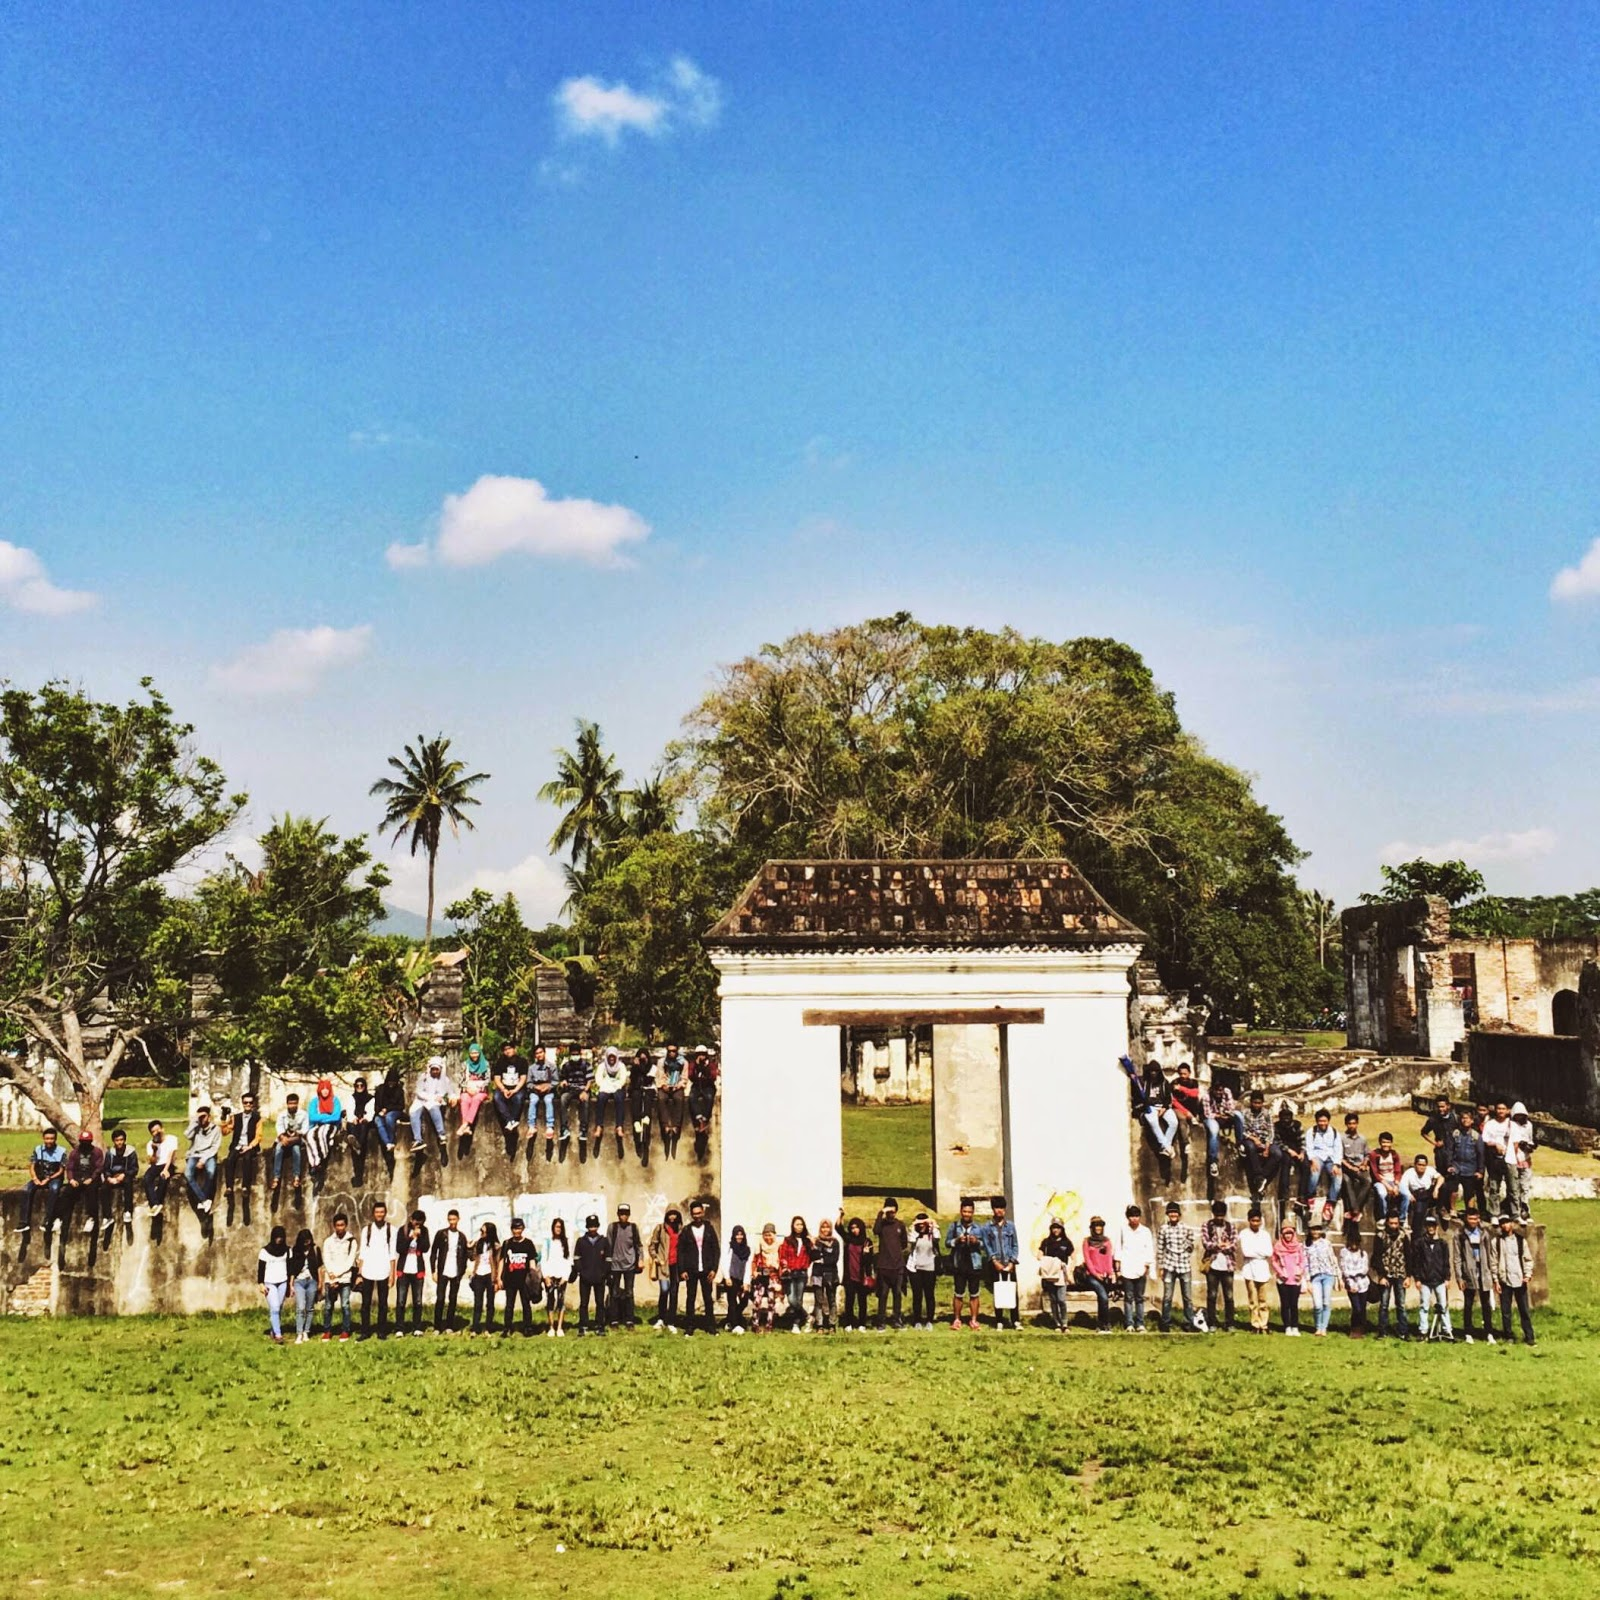 Peserta WWIM #11 Banten - Photo By: @prabows On Instagram